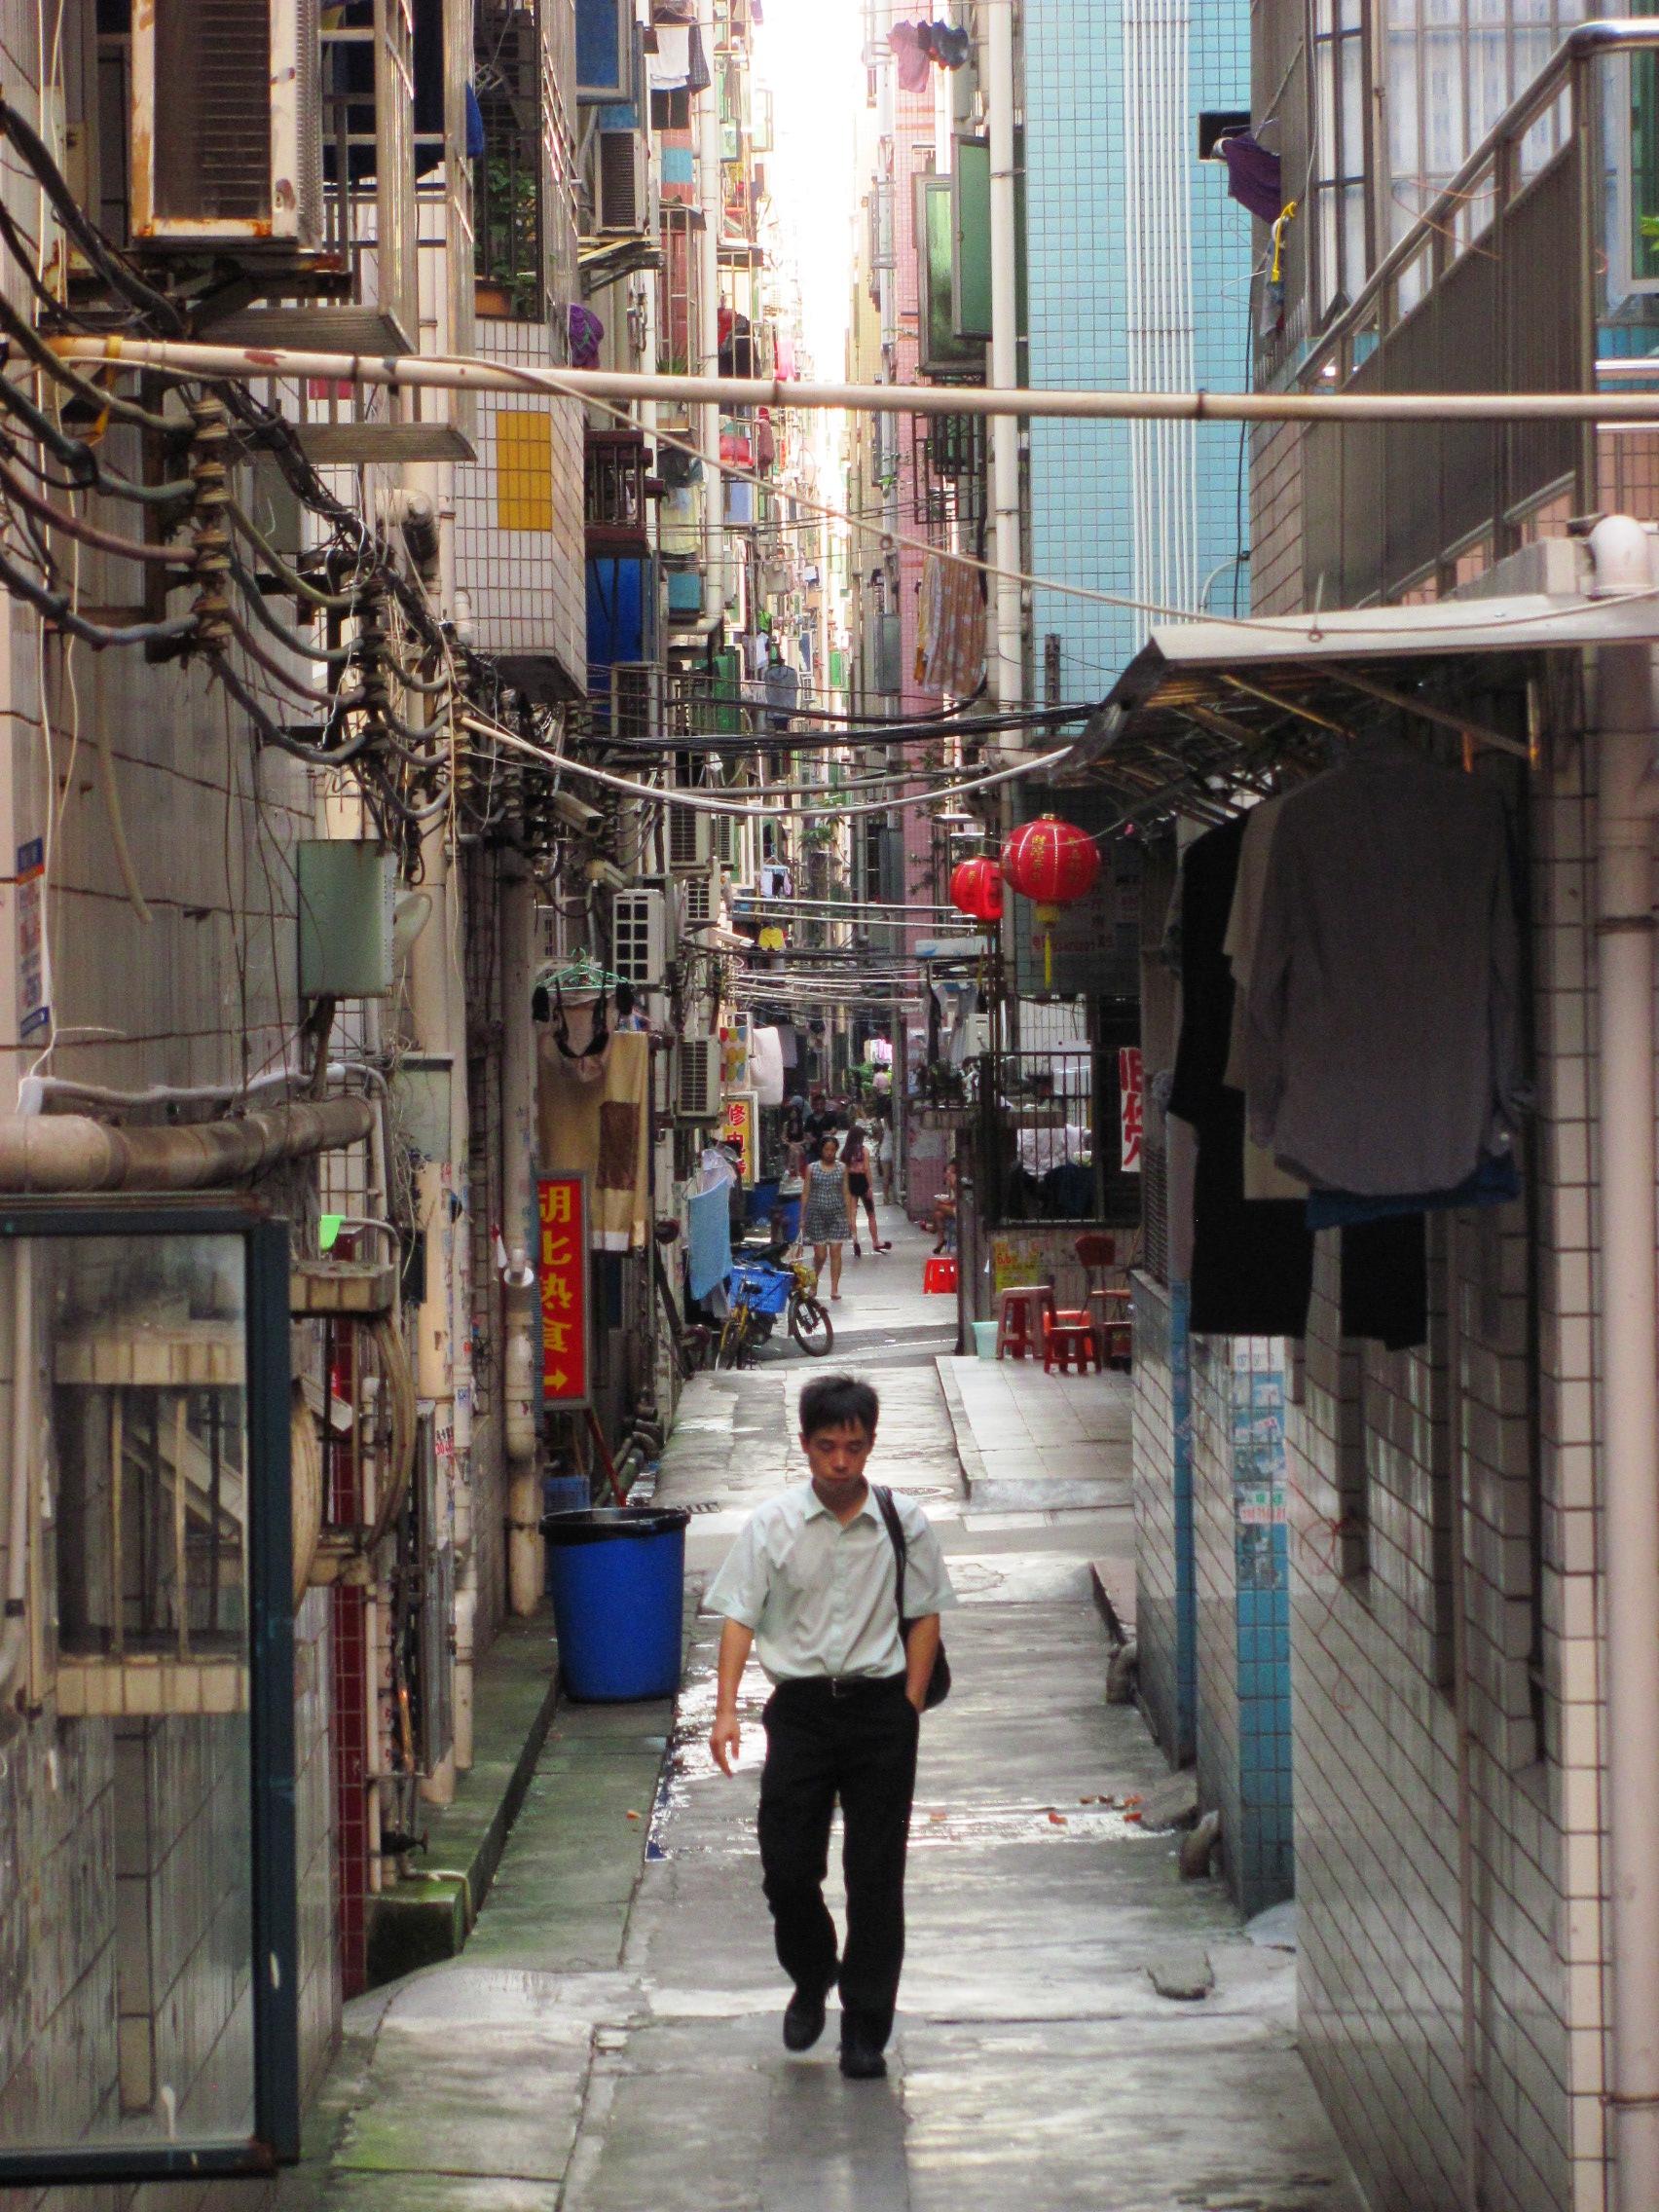 Shangshadongcun urban village, Shenzhen. Photo by Taiwan Gazette.